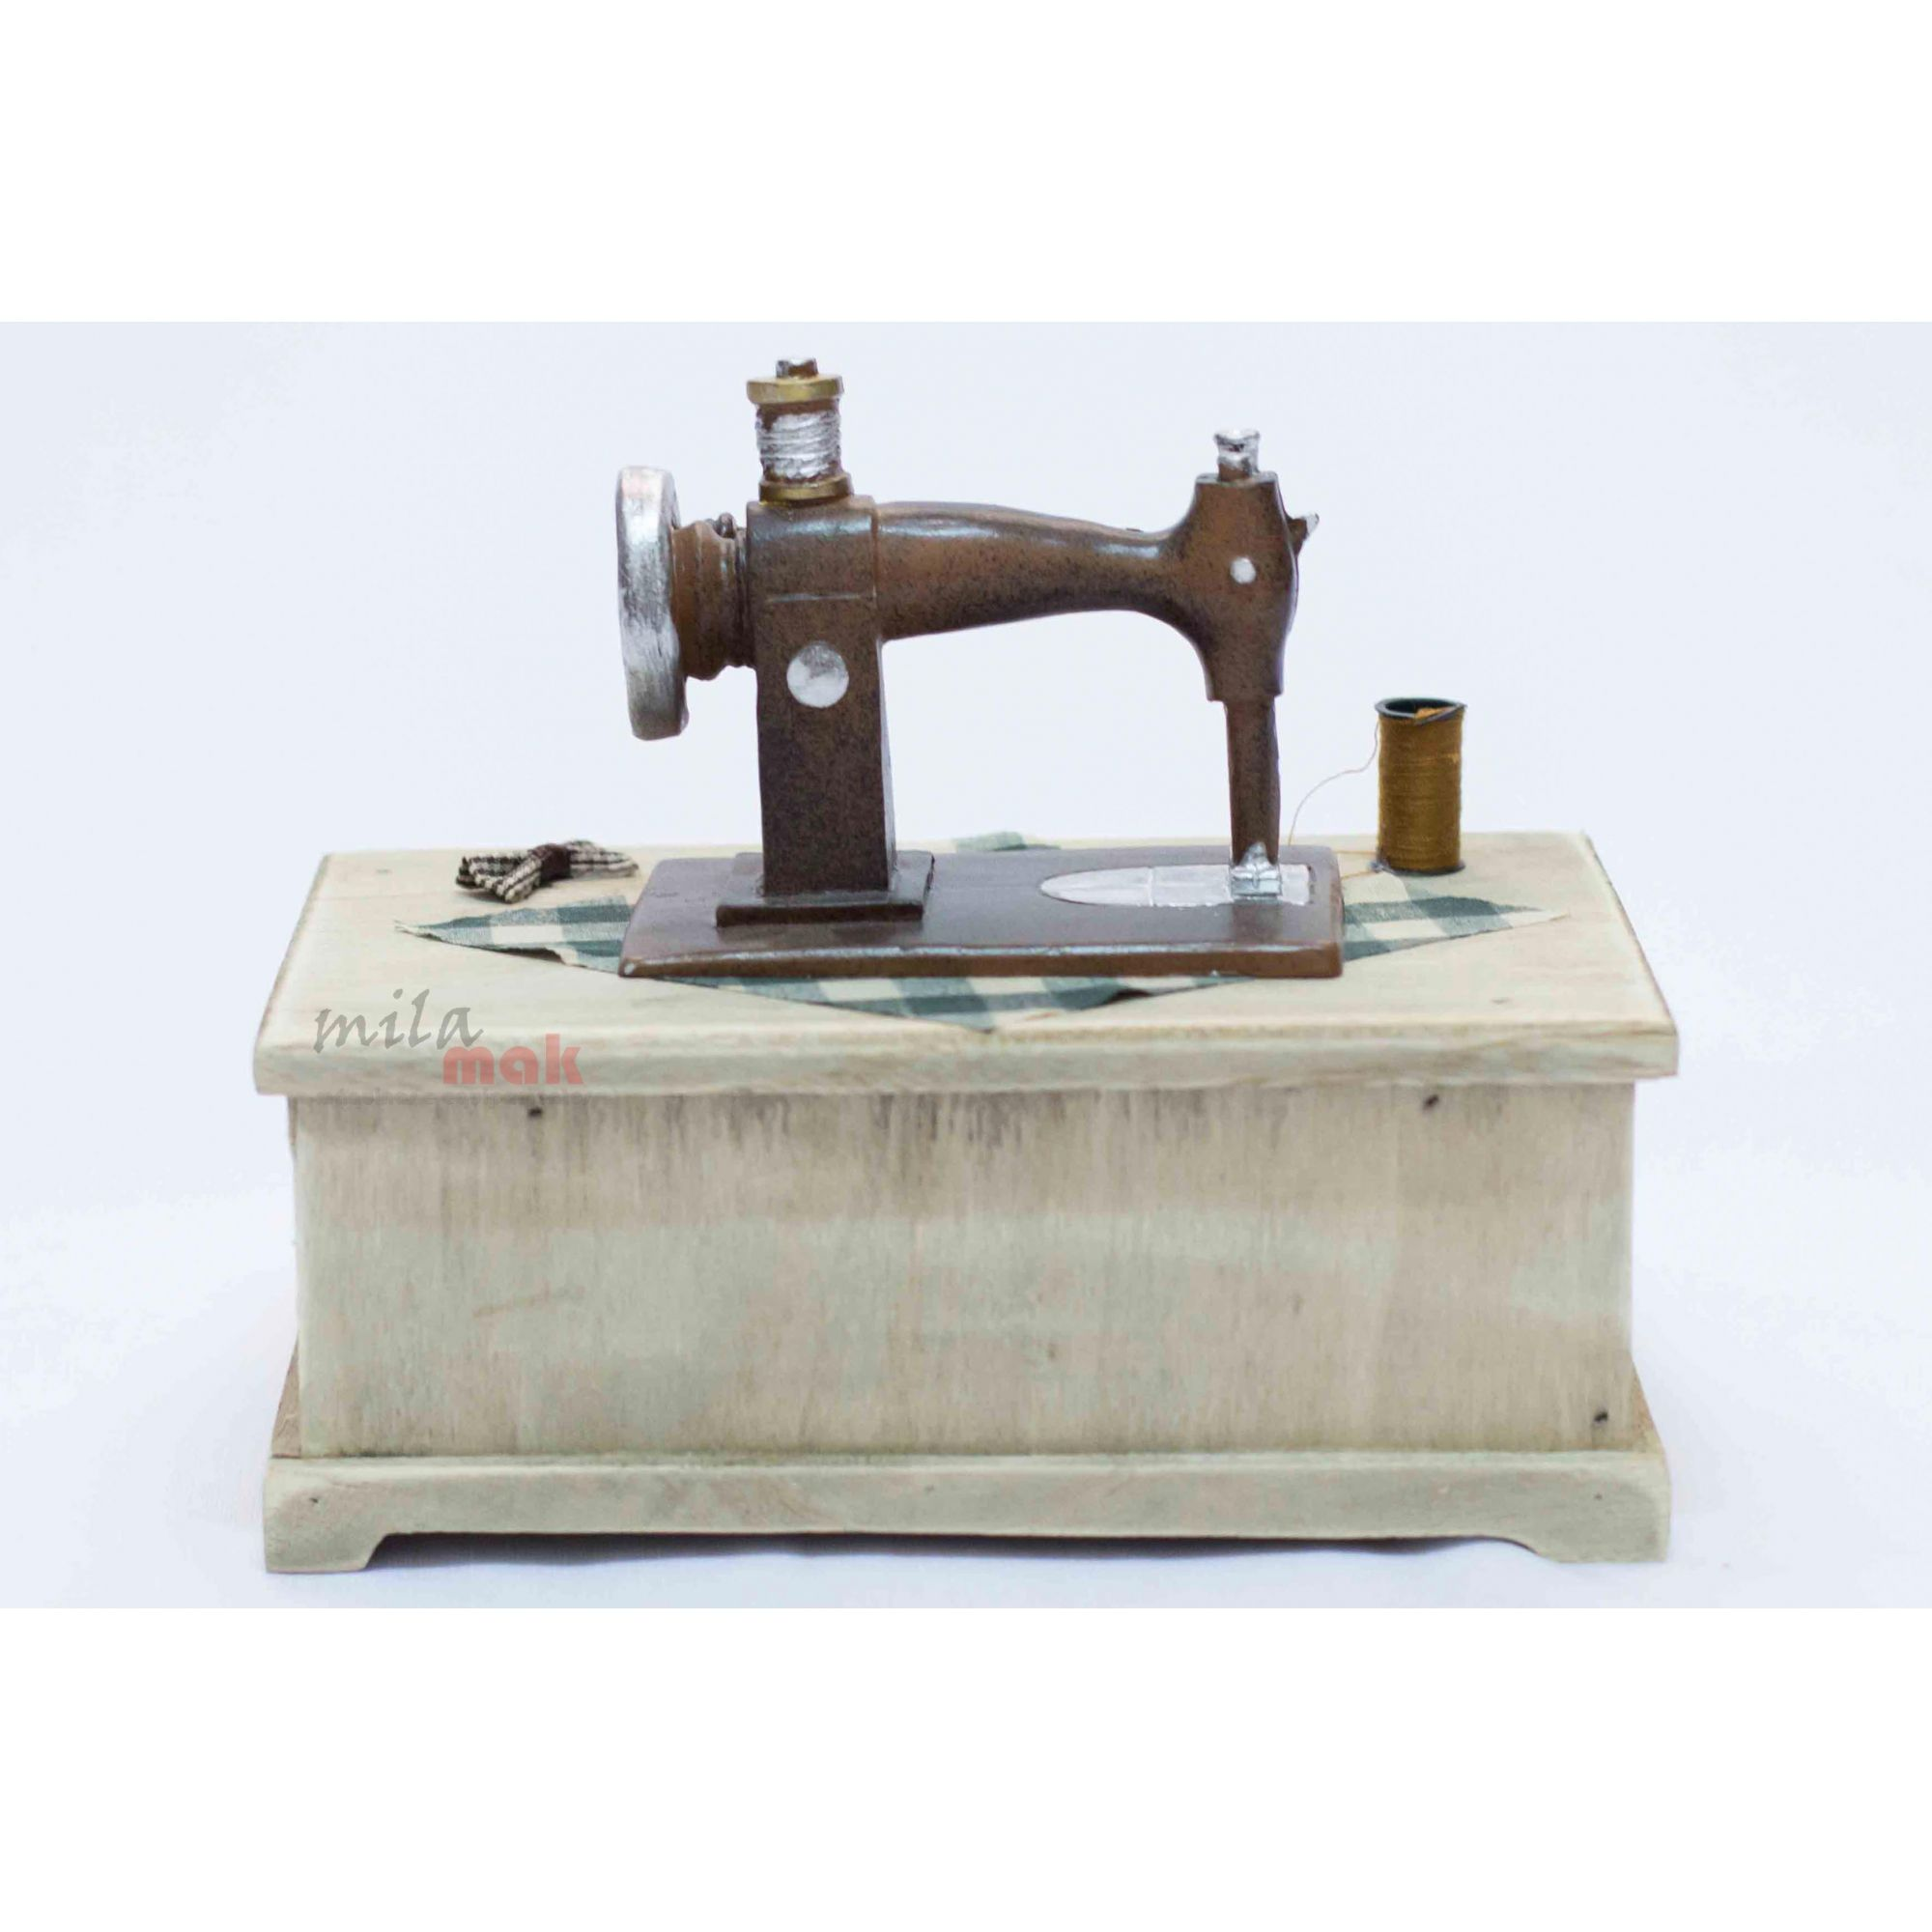 Mini Máquina De Costura Decorativa e porta objeto - com gavetas